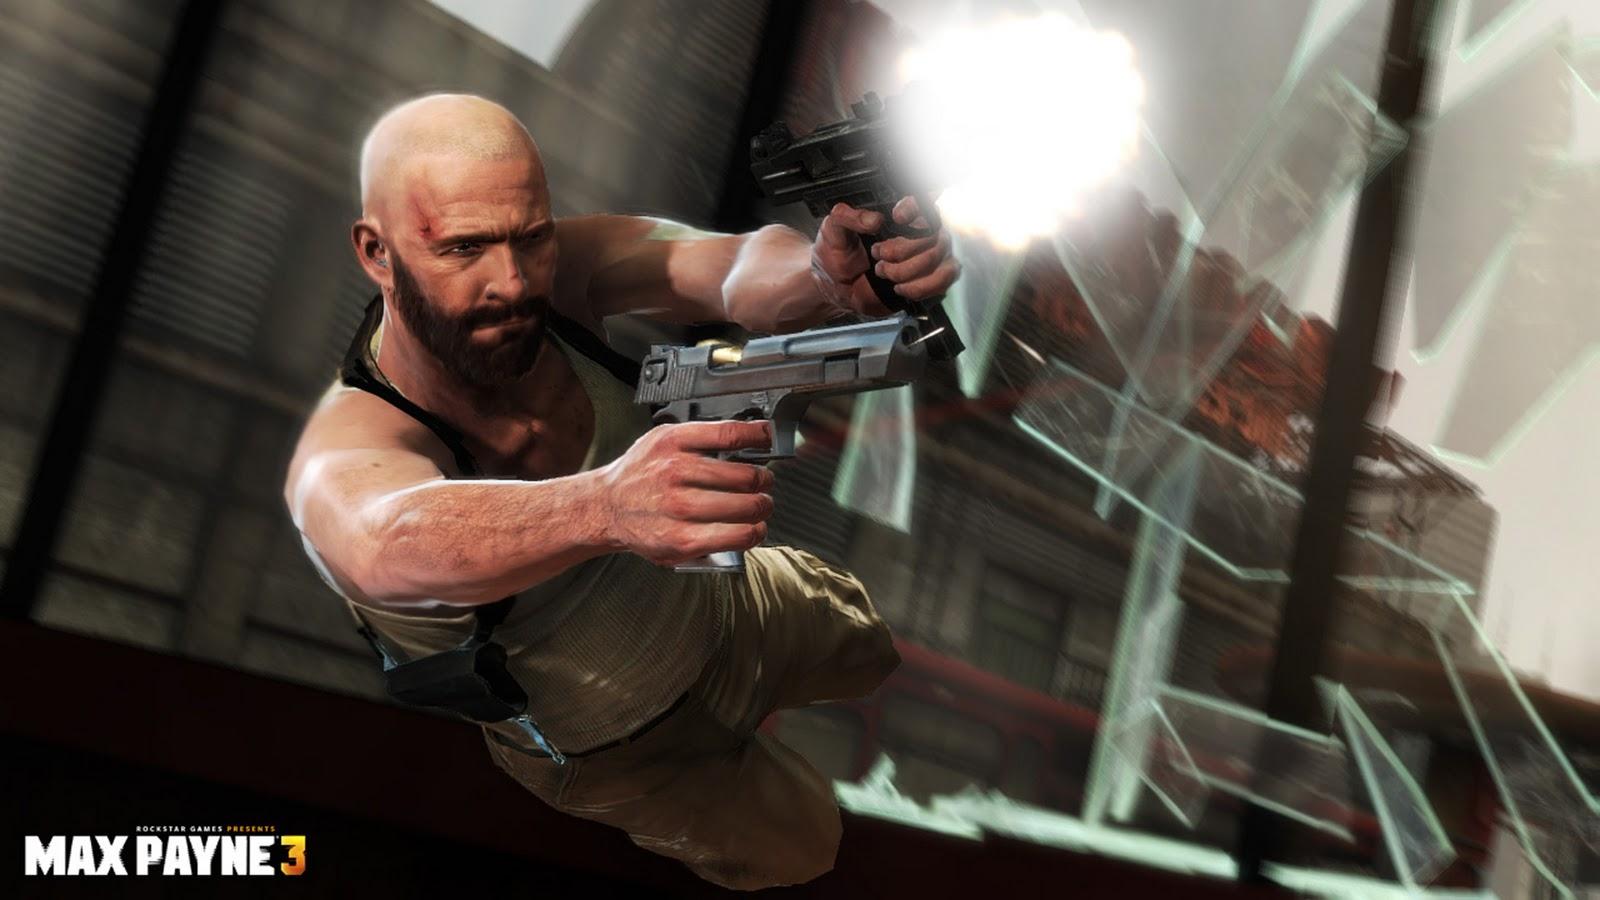 http://2.bp.blogspot.com/-k-Nqyyw4Y30/Twokaq6TxXI/AAAAAAAADHs/-Ra0HckN4cI/s1600/max+payne+3+poster+bald+wallpaper+shooting+gunkata+handgun+baretta+9mm+1912+45+40+caliber.jpg